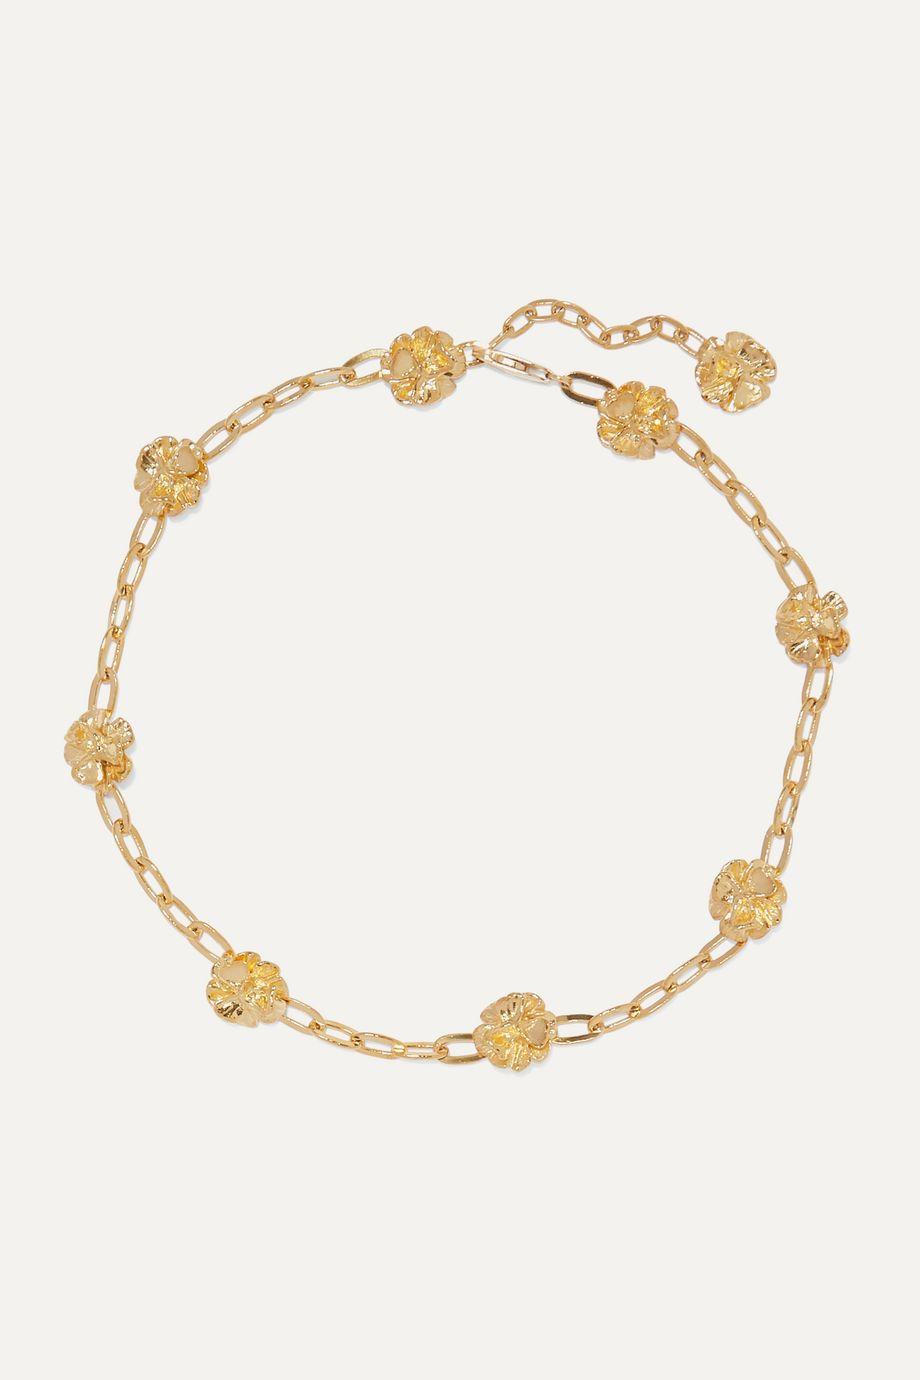 Leigh Miller + NET SUSTAIN gold-plated choker